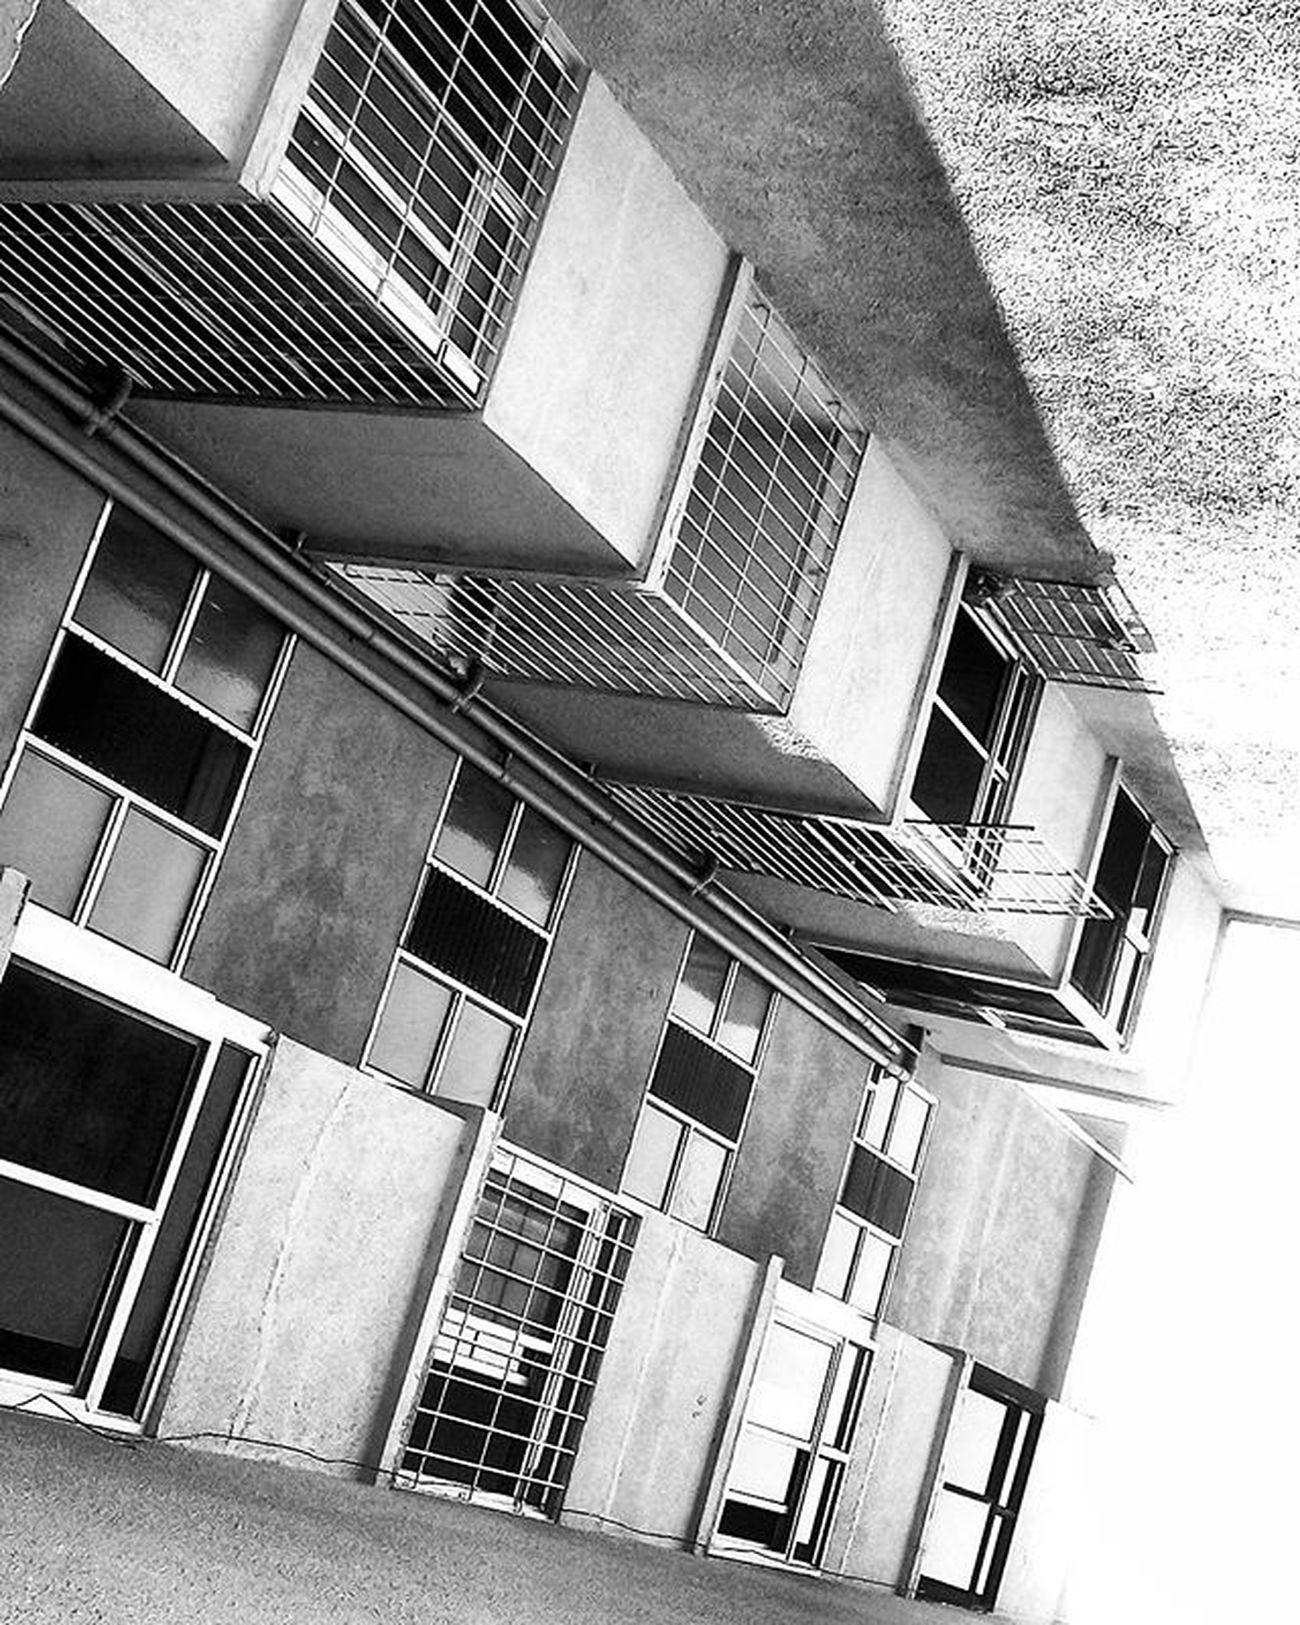 Featuregram VSCO Vscocam Vscogrid Buildings Flat Blackandwhite Upsidedown 1morephotography Instagram Monoart_ Feature Featureme Instagood 2instagood Justgoshoot Urban City Urbanexplorer Instadaily Photooftheday Myfeatureshoot TBT  Instadaily Strideby